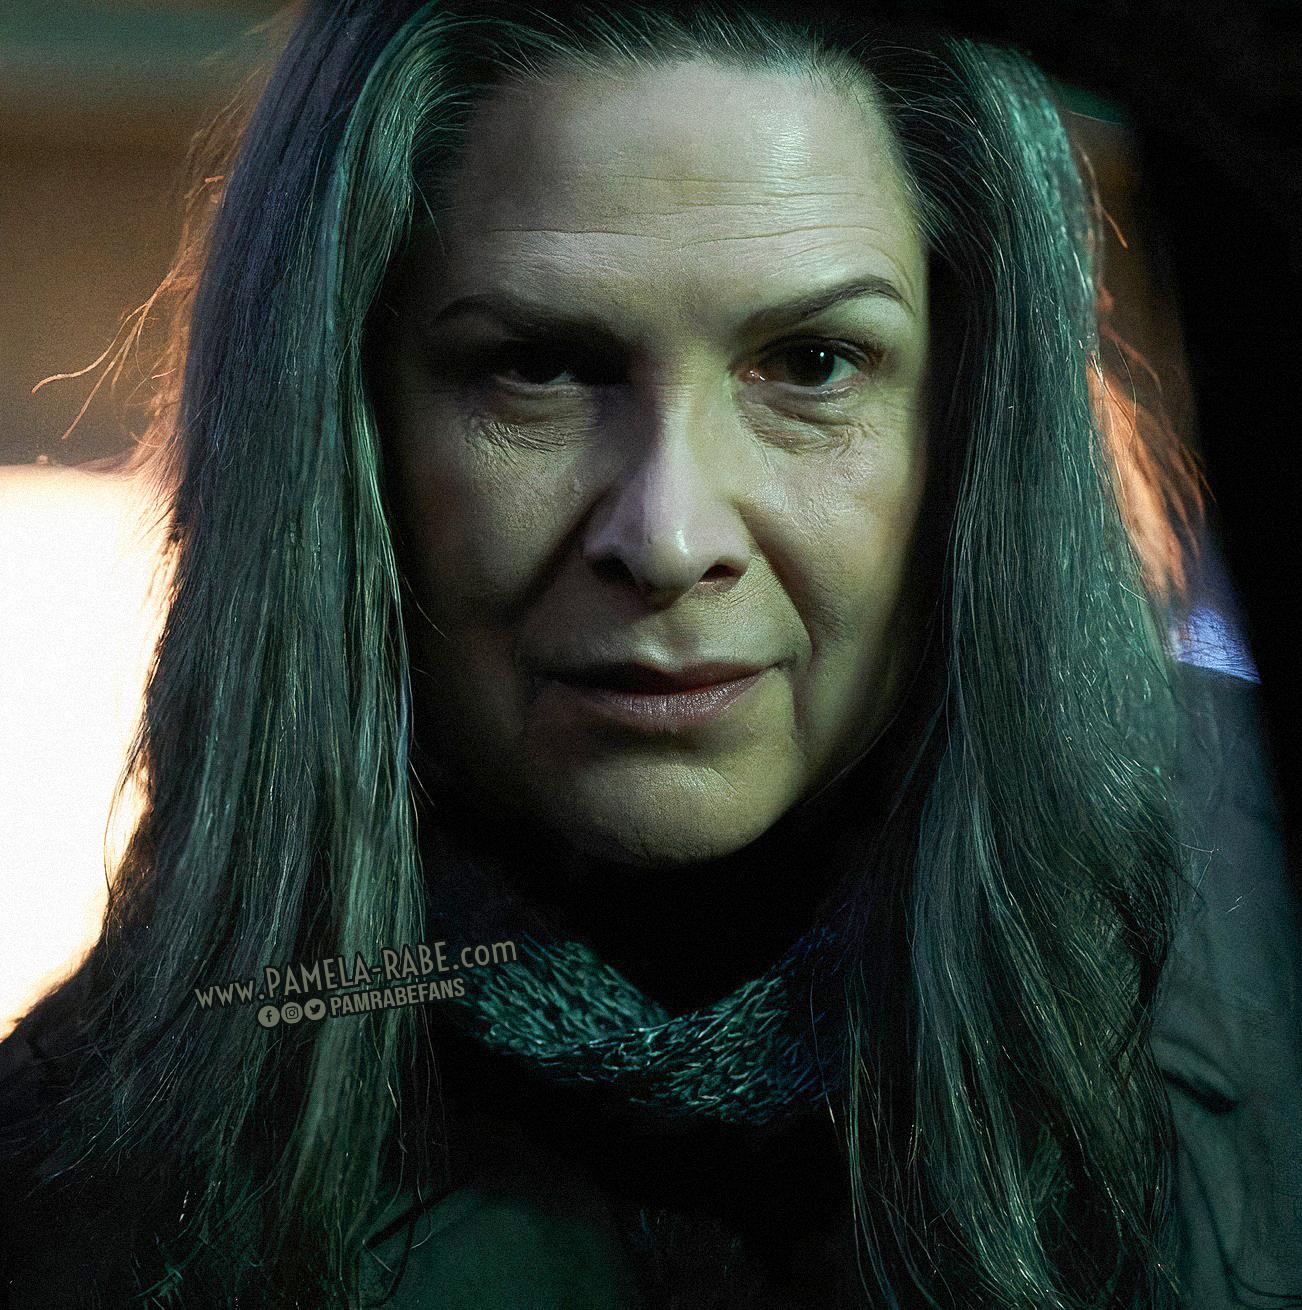 Pamela Rabe | Wentworth Season 8 Episode 2